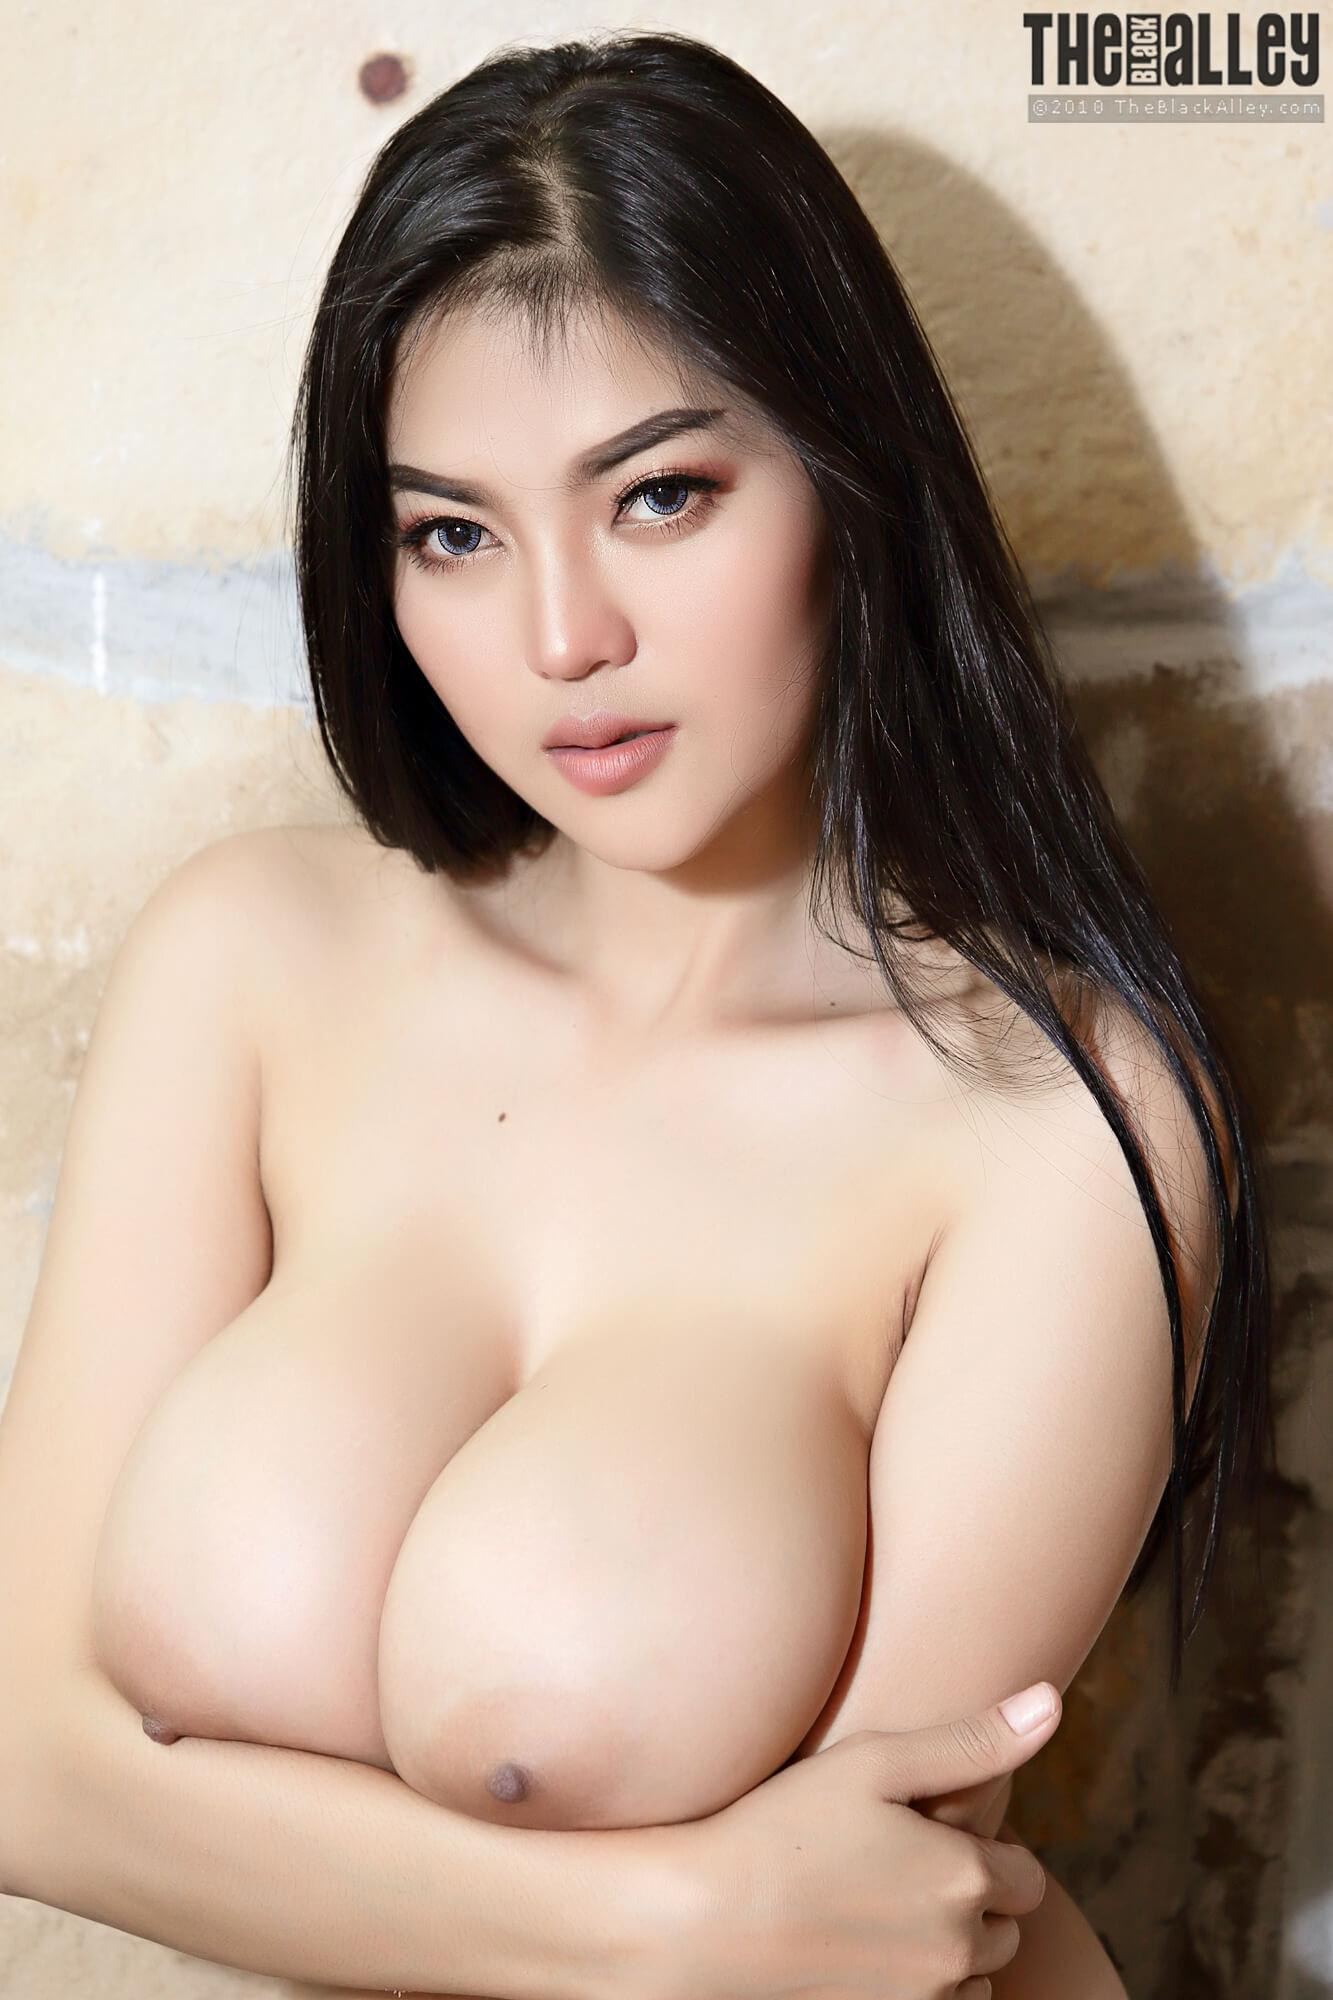 sheer to the waist pantyhose photos